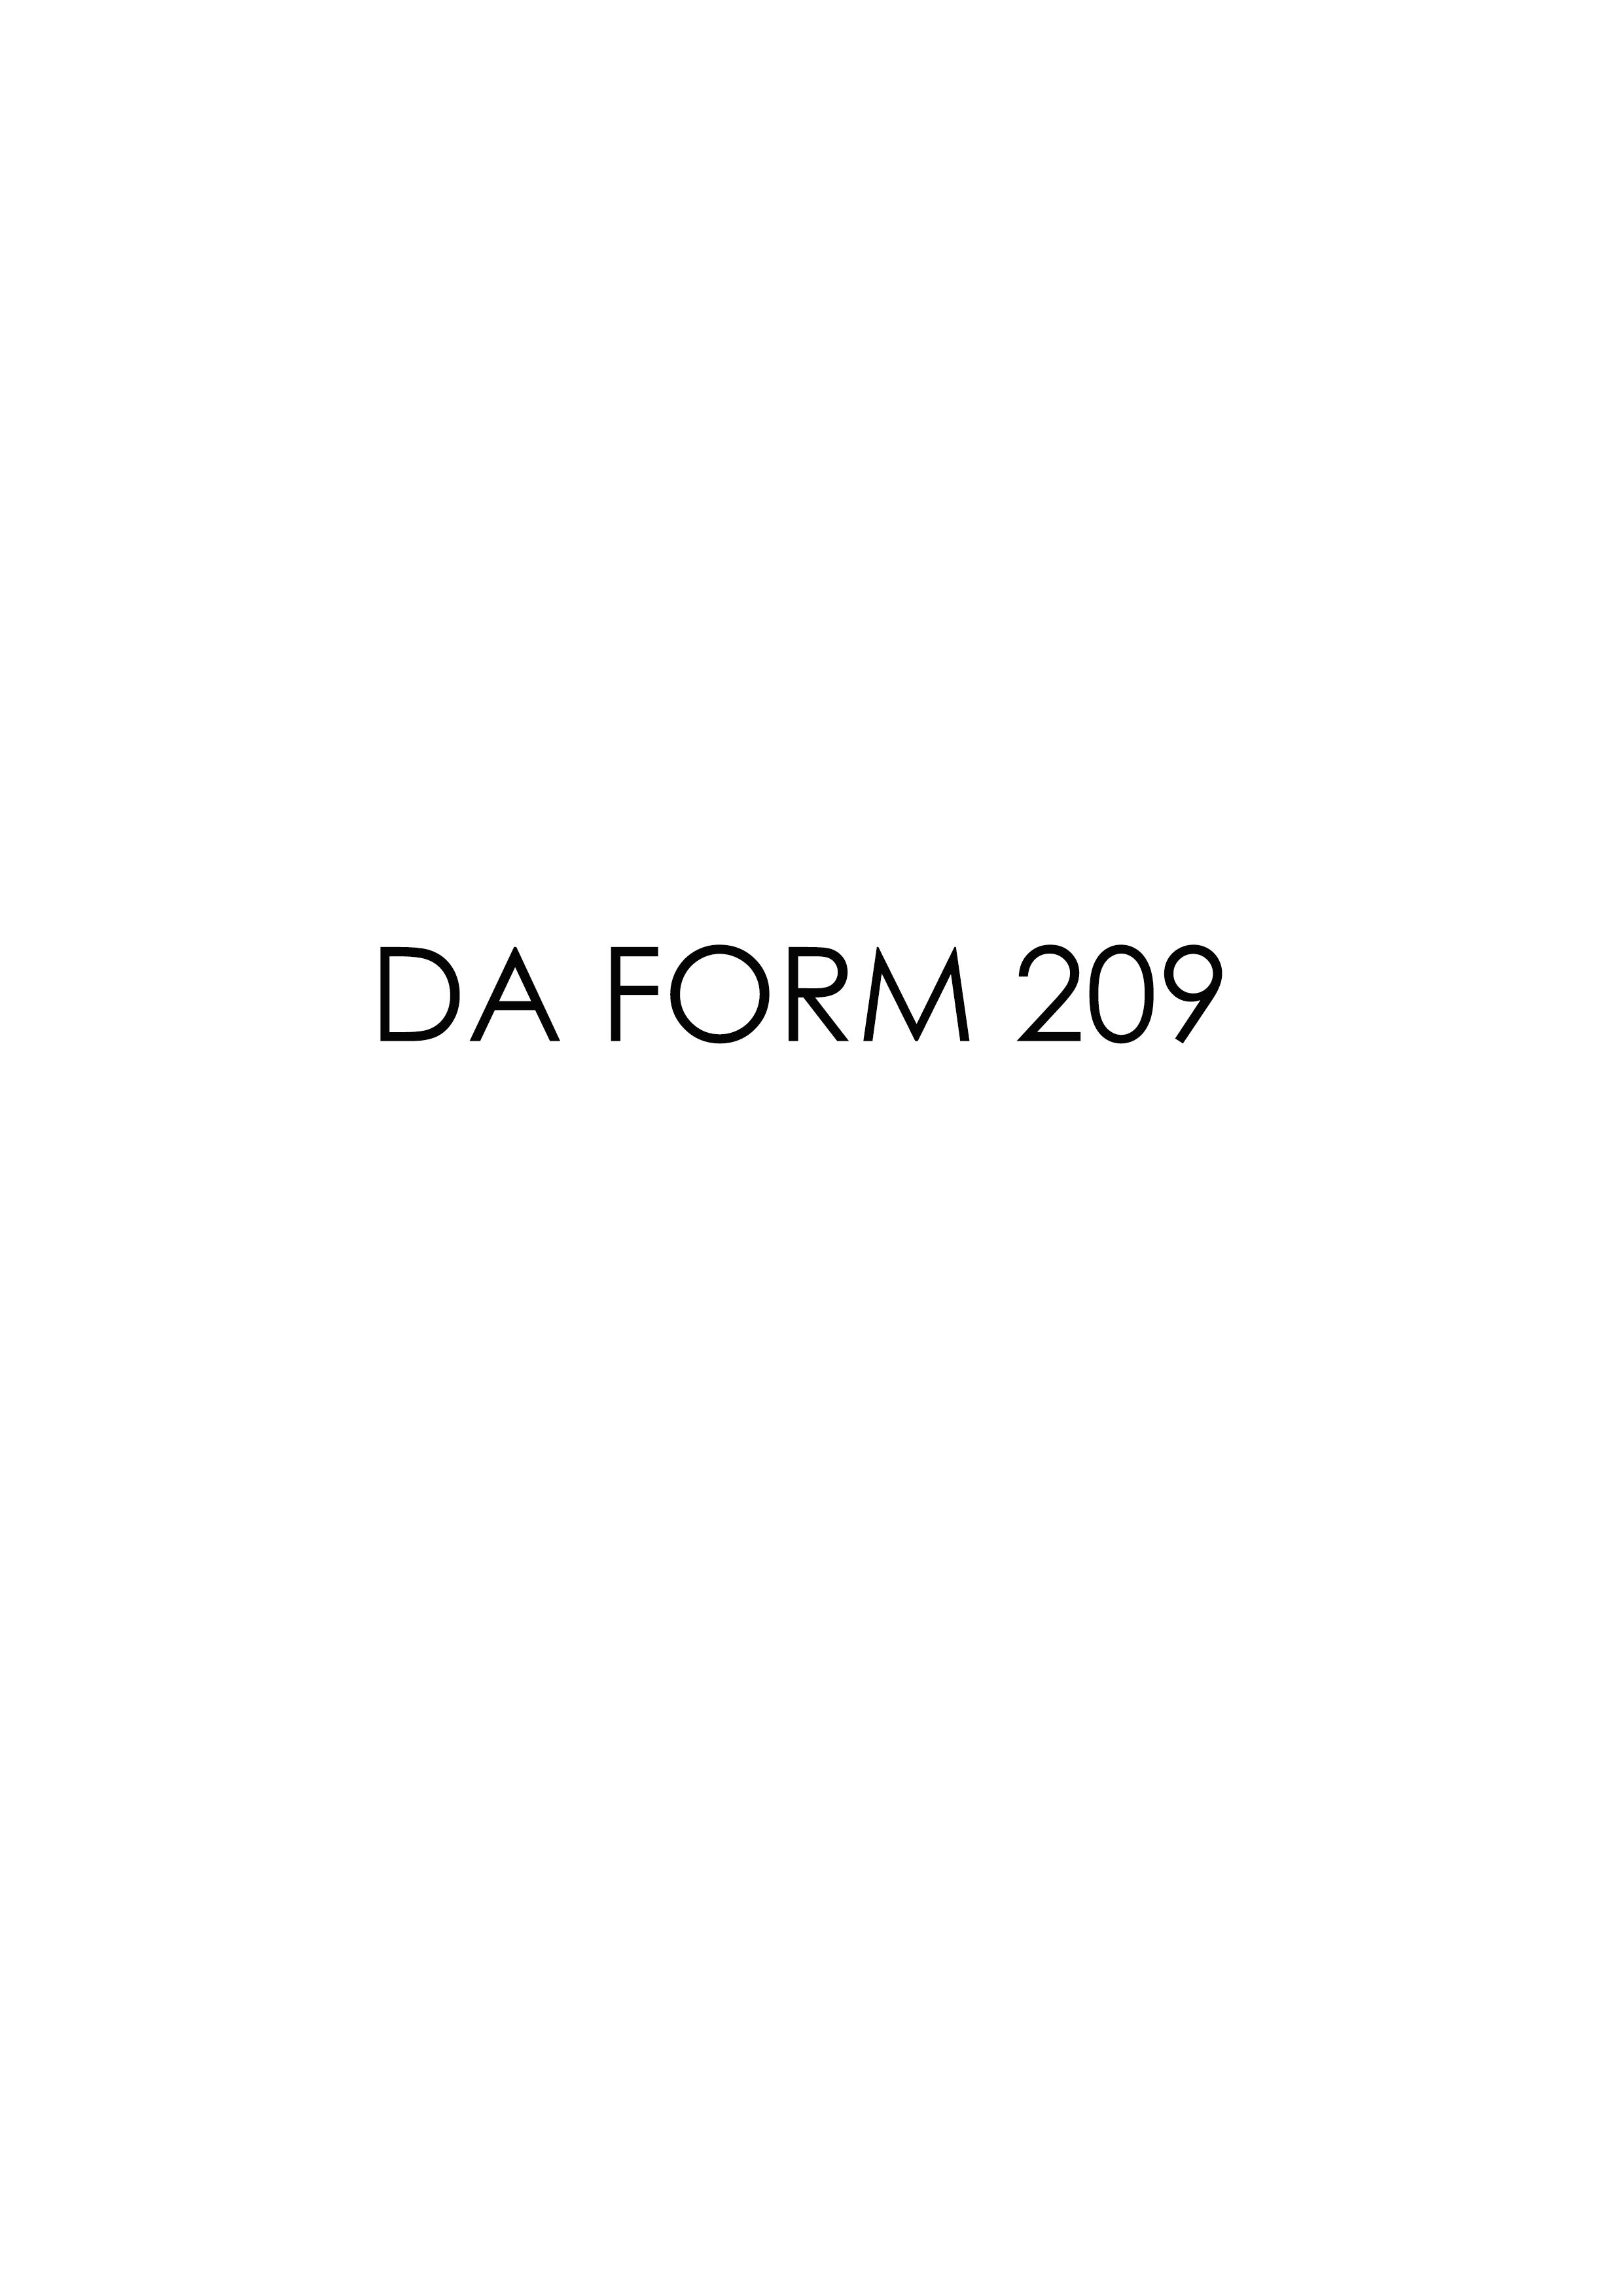 Download Fillable da Form 209